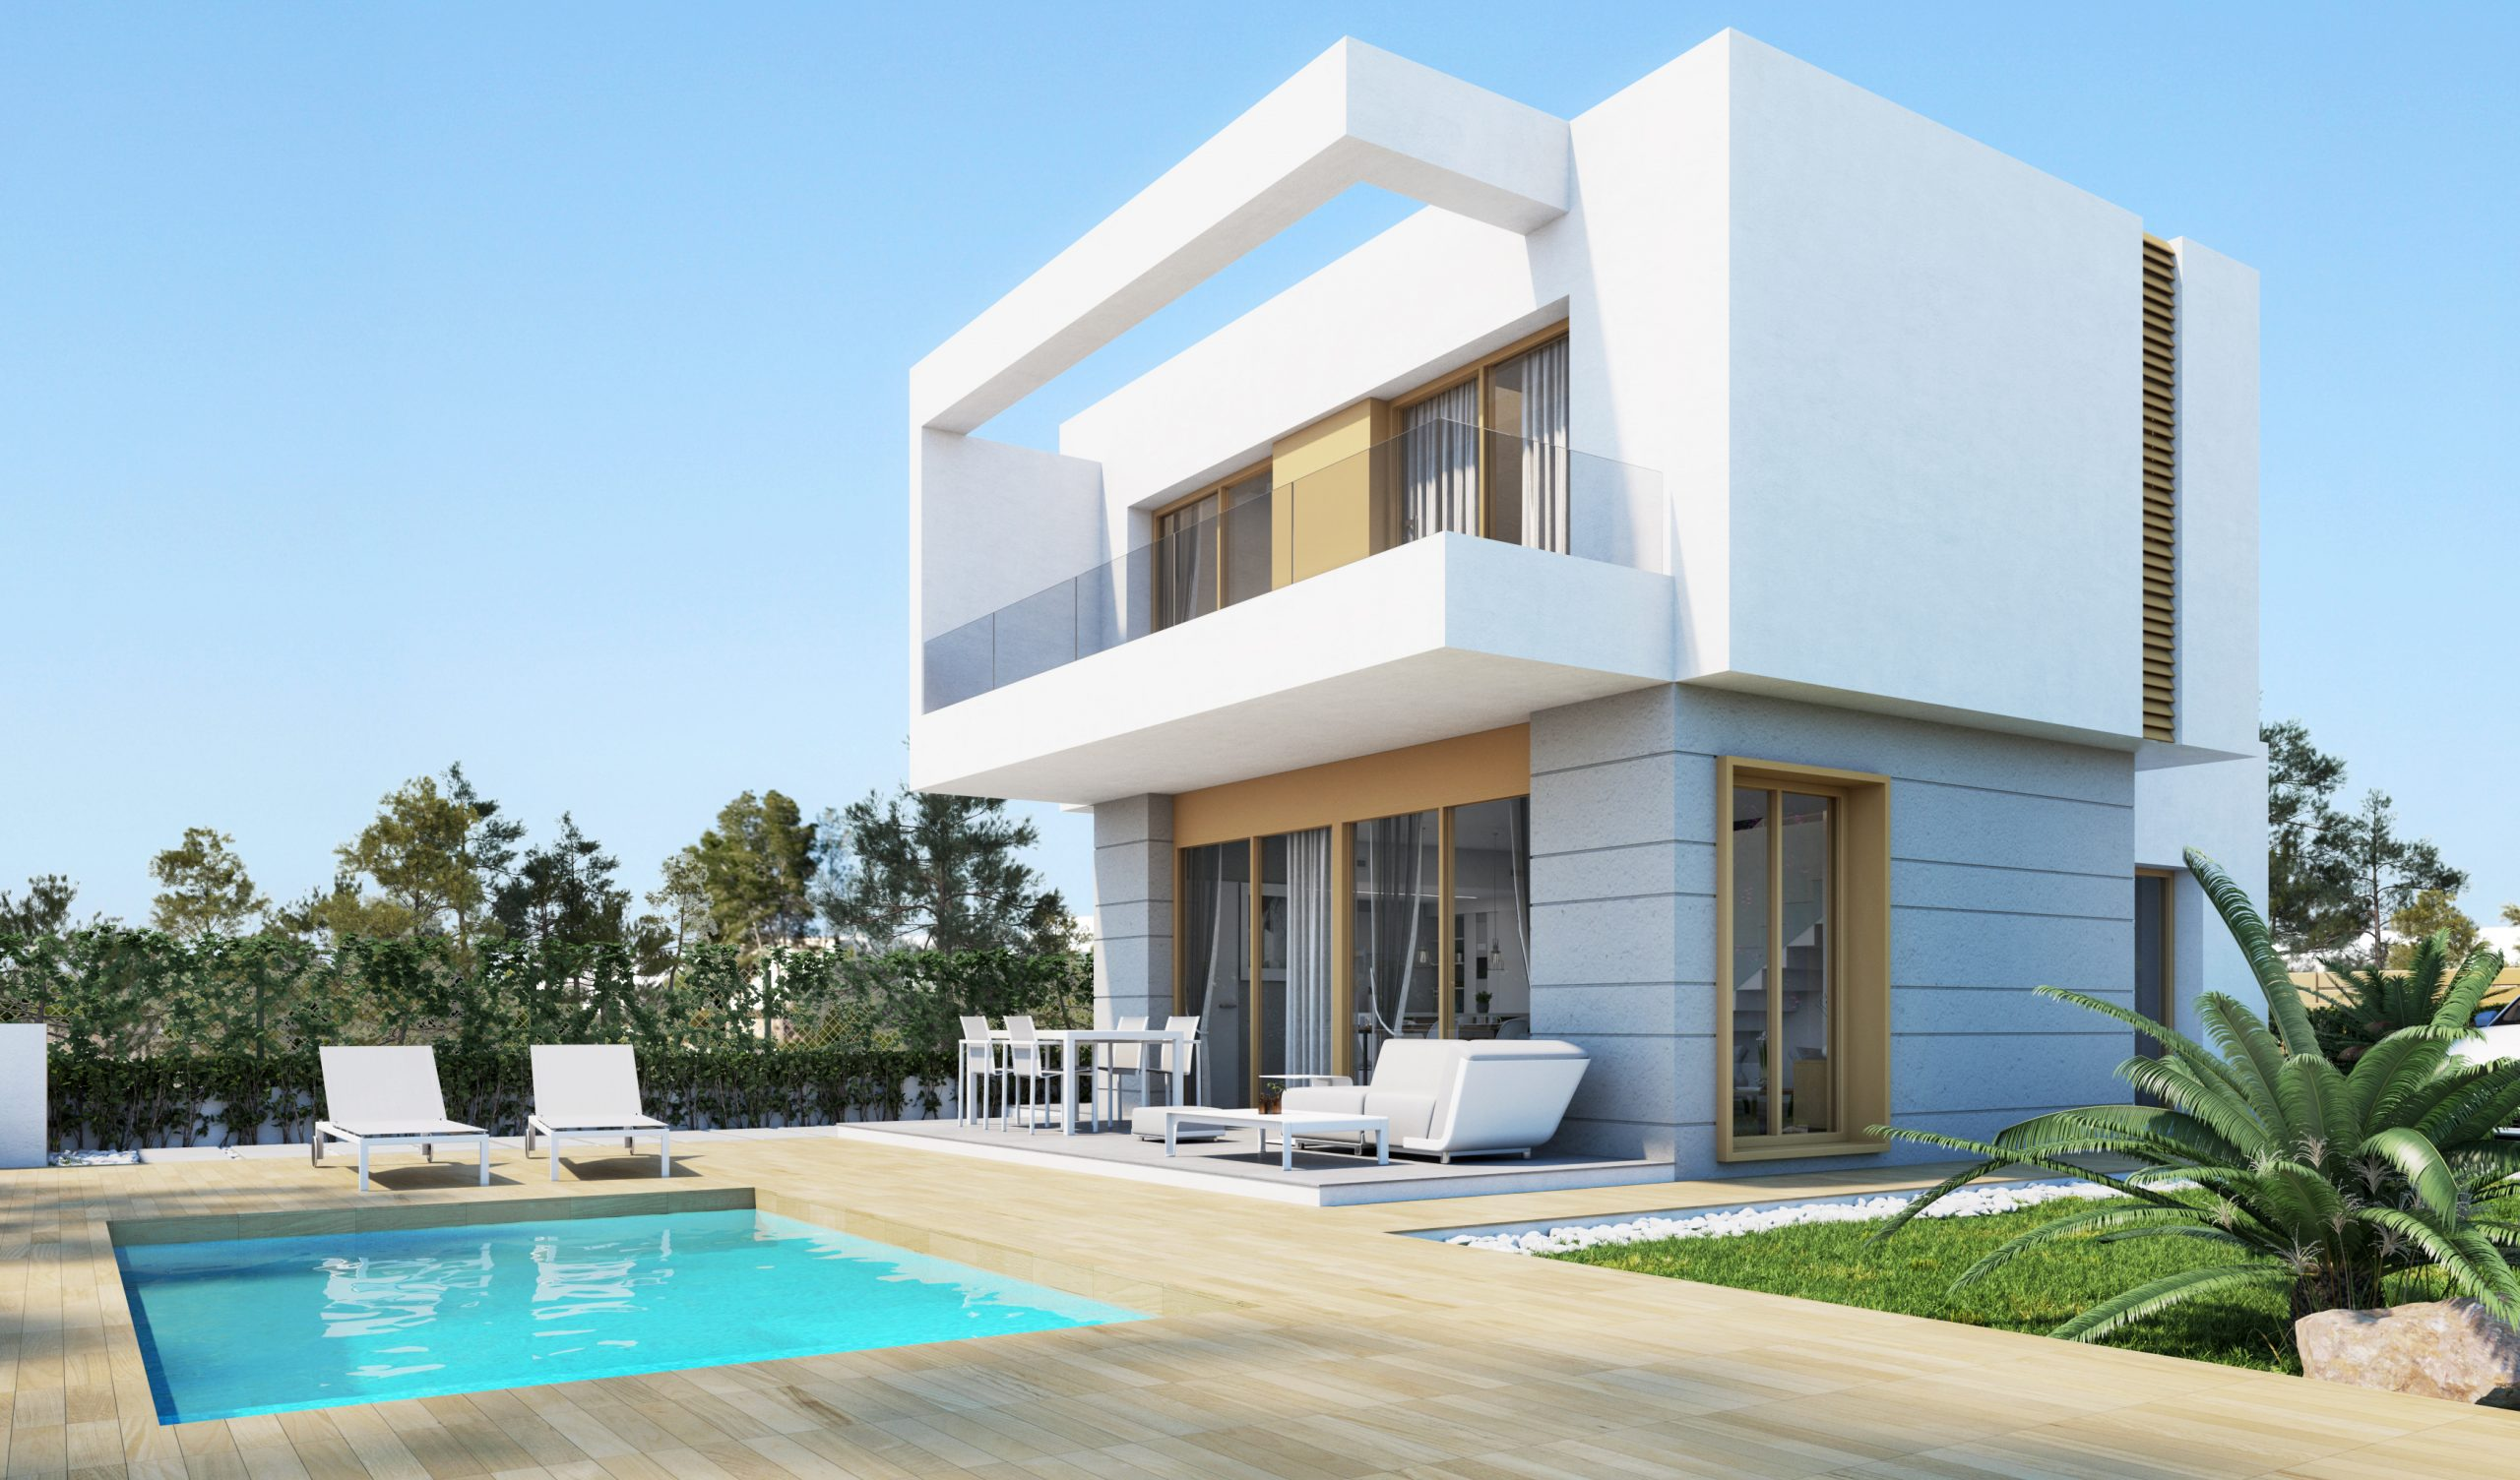 Villa Malé – Golf luxury villa in Alicante